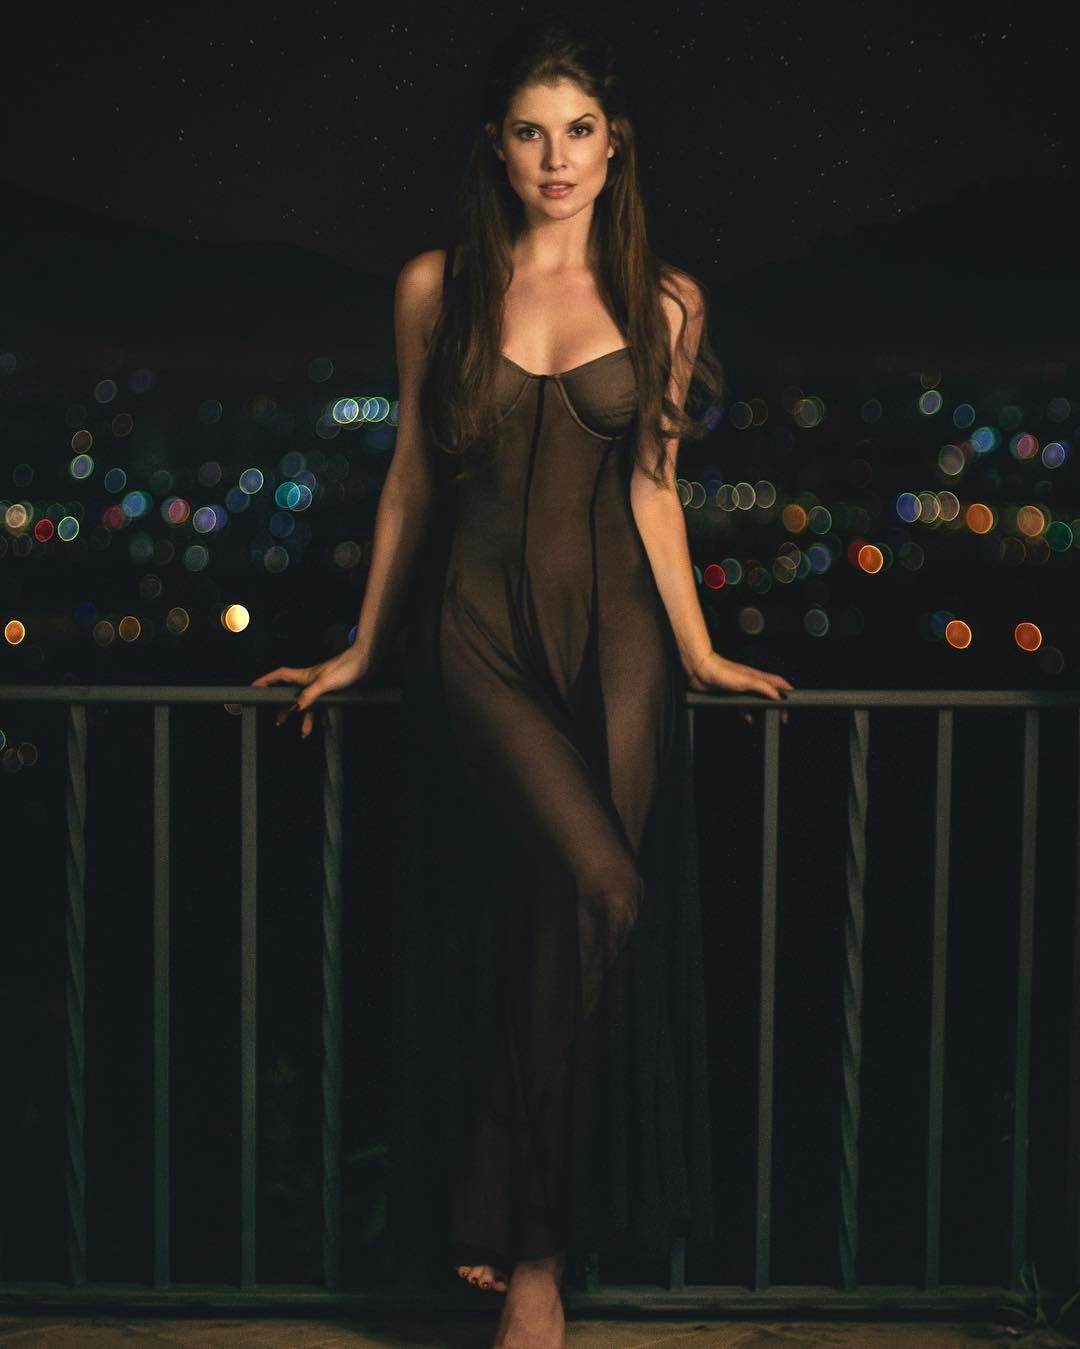 Amanda Cerny Nackt hintergrundbilder : frau, modell-, amanda cerny, nackt